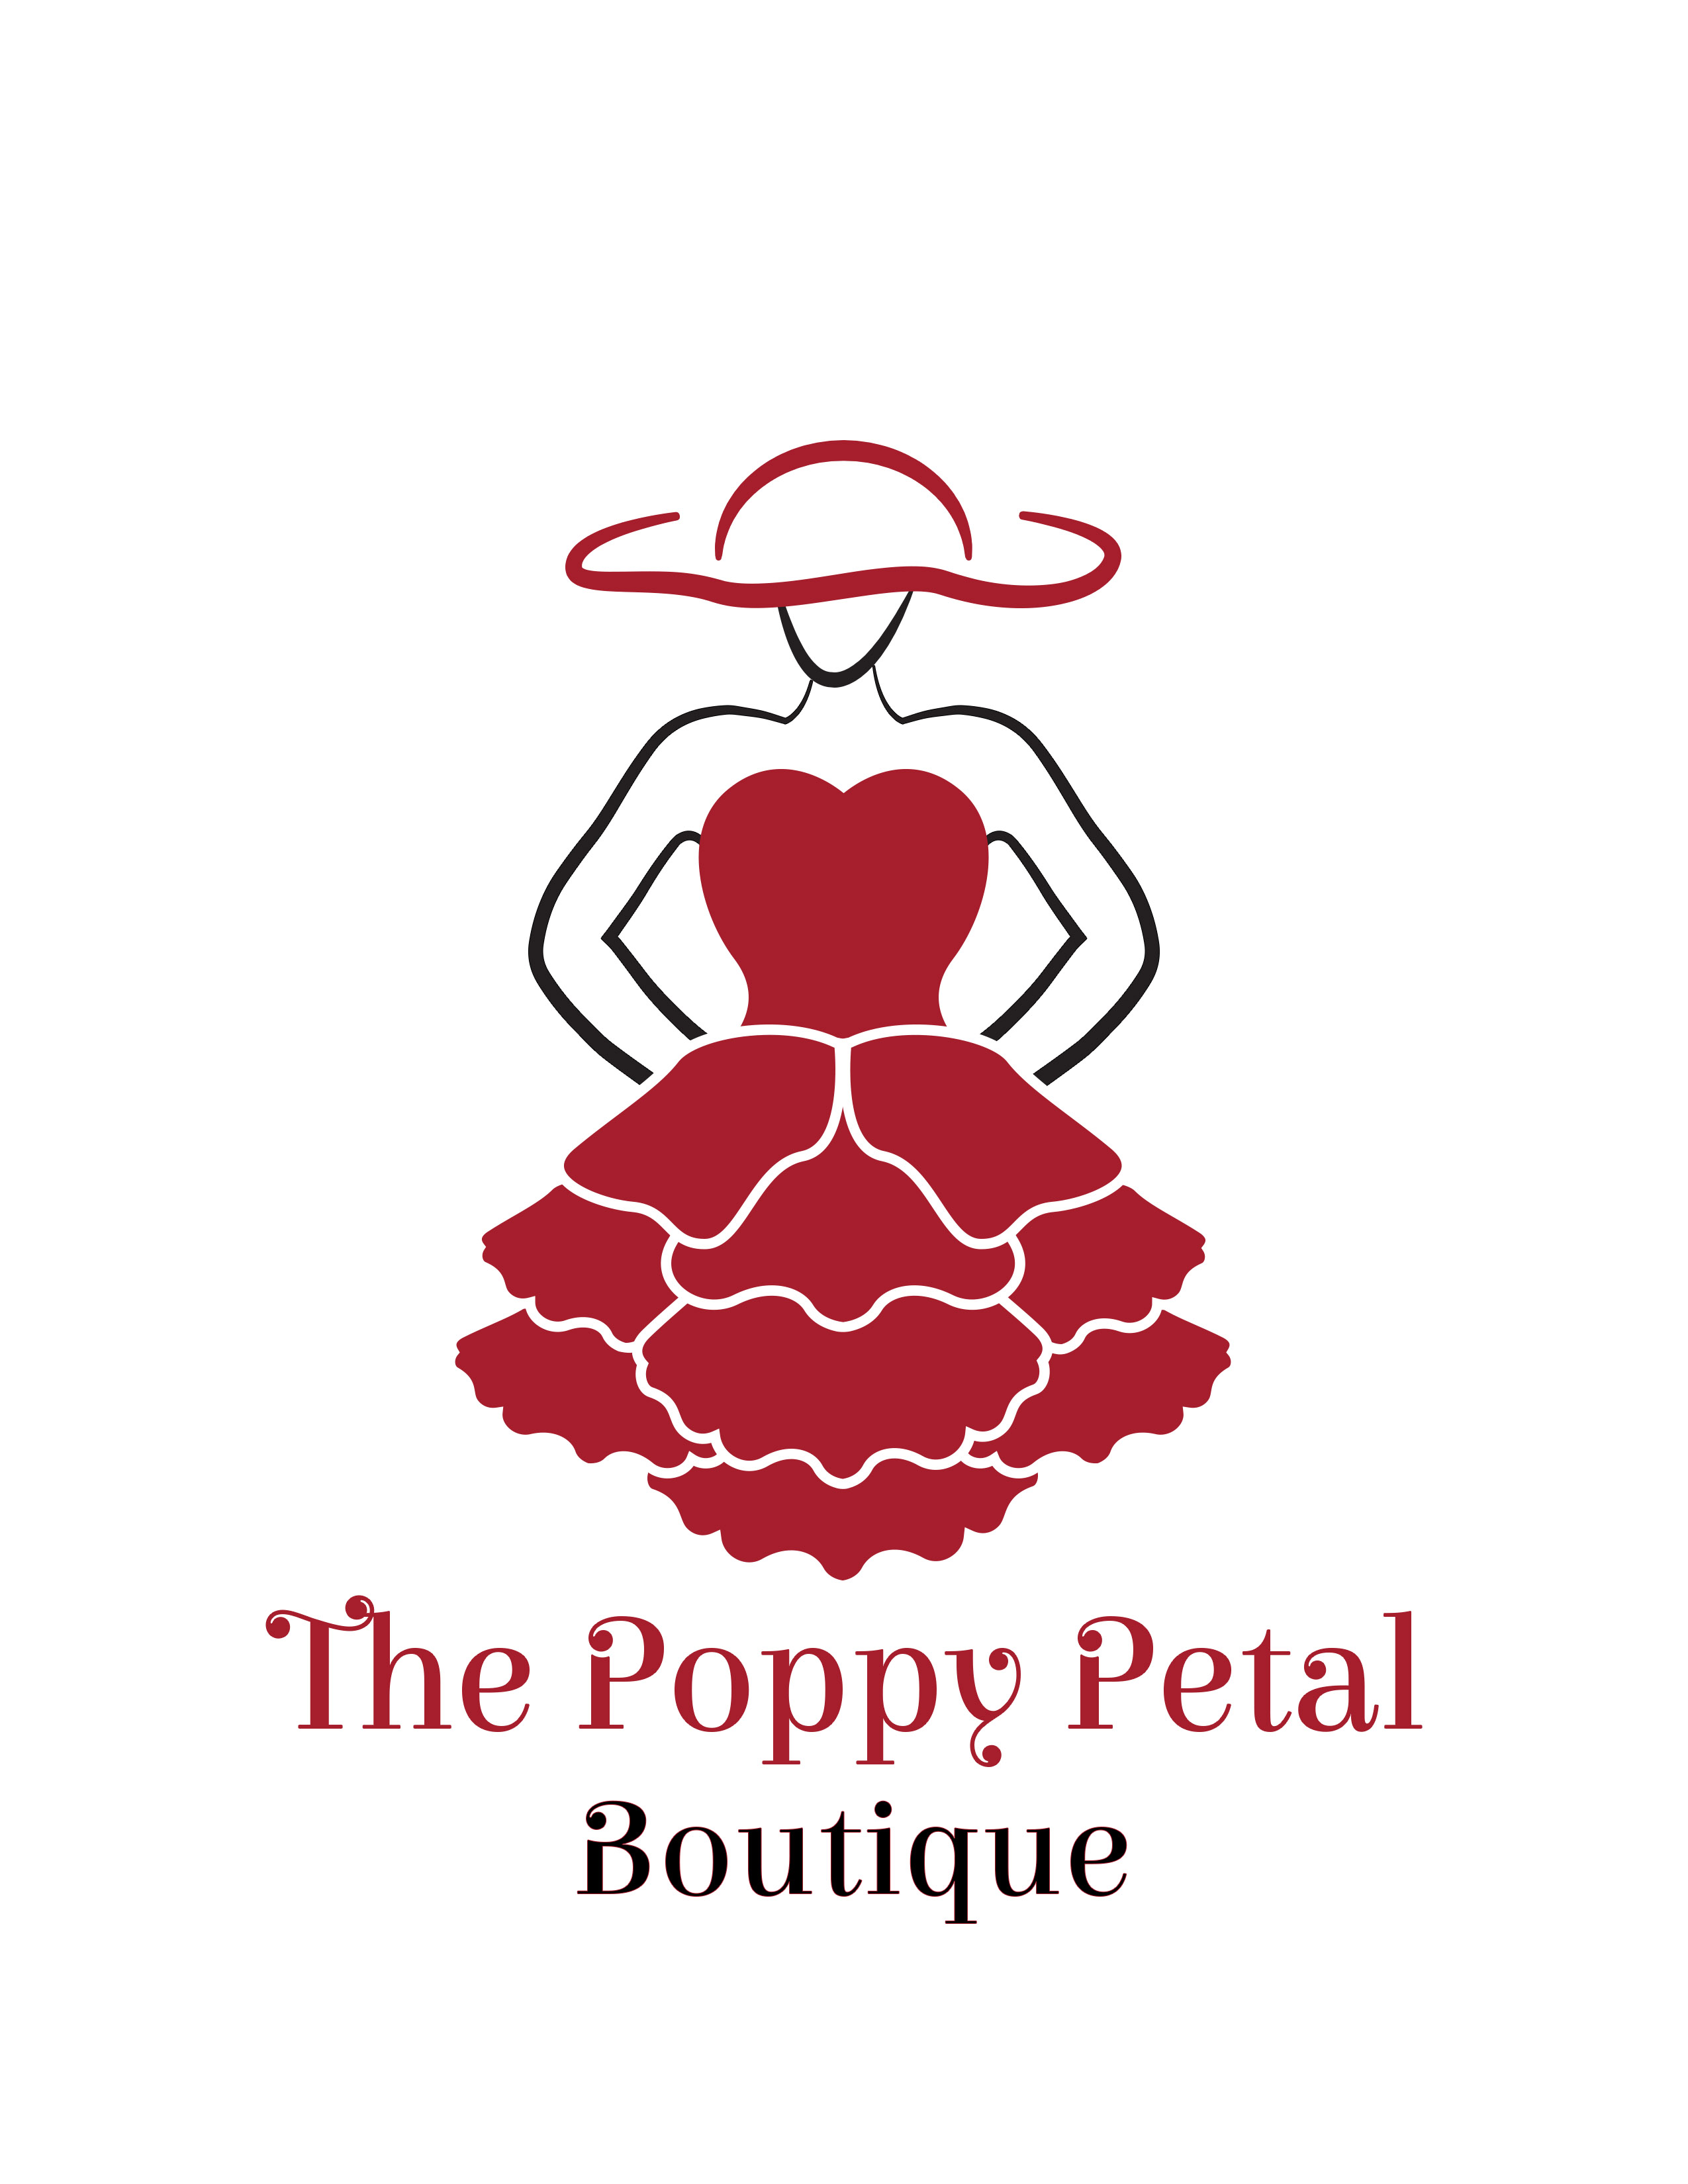 The Poppy Petal